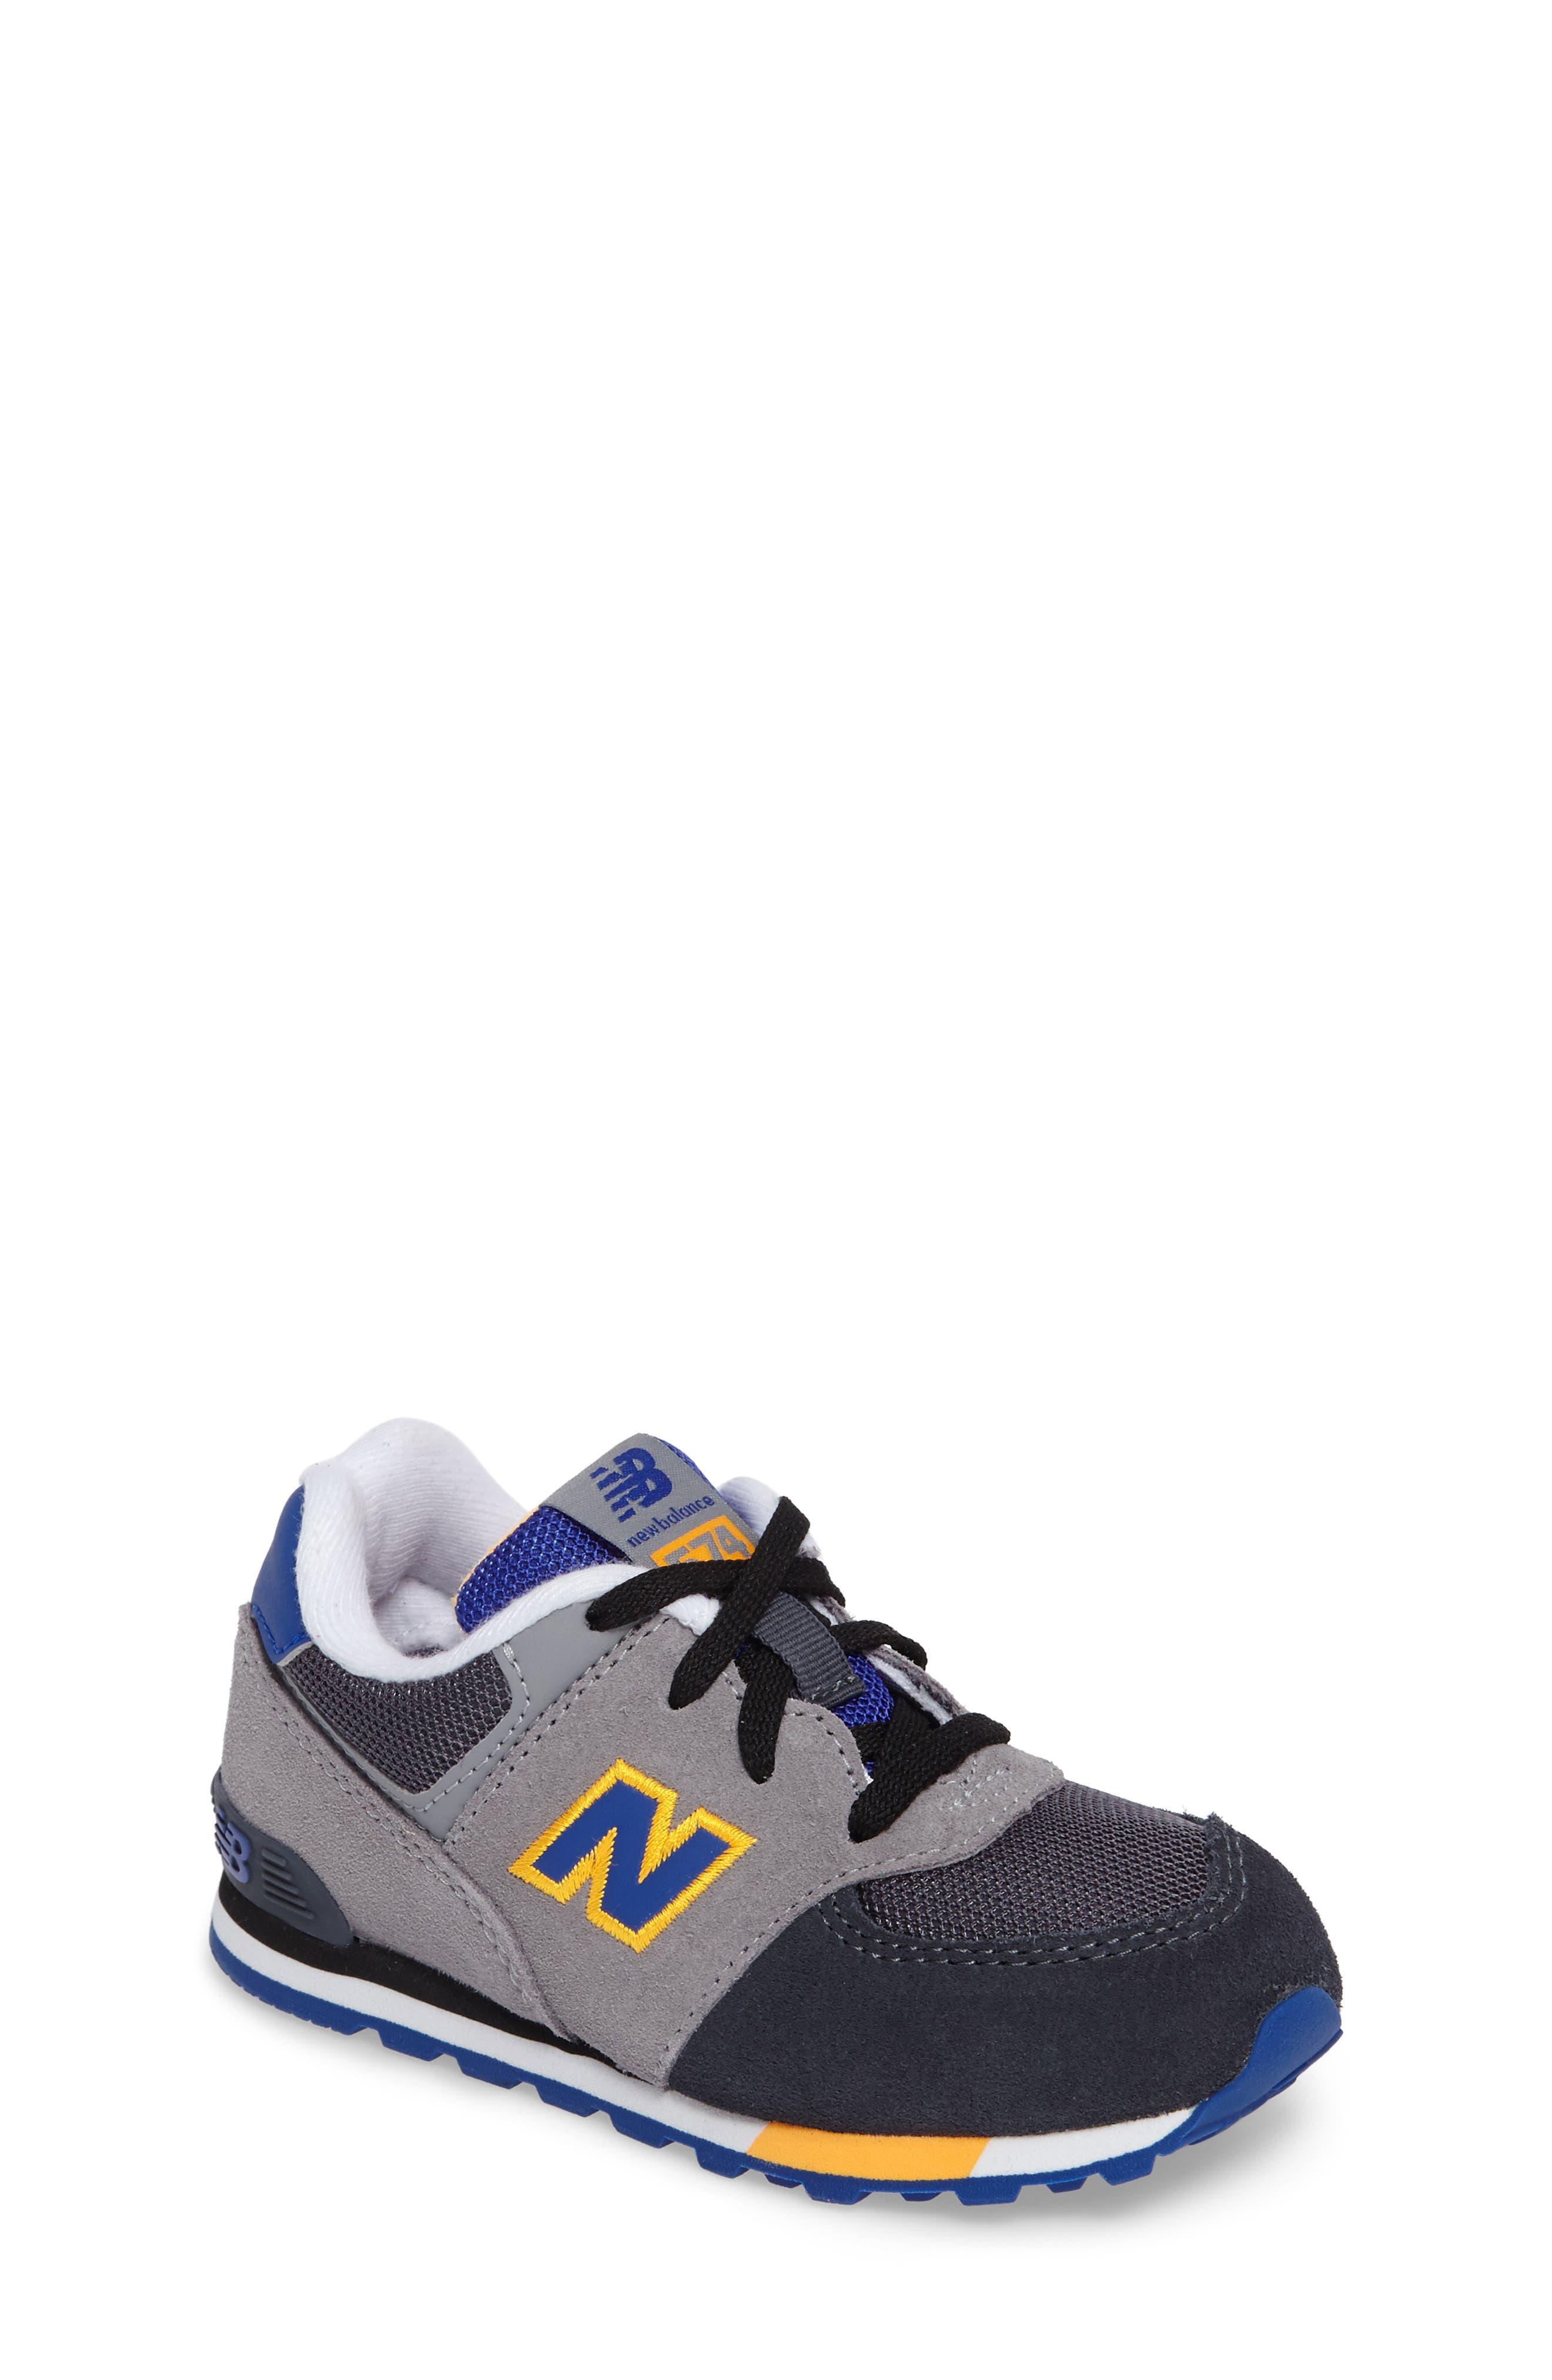 Main Image - New Balance 574 Cut & Paste Sneaker (Baby, Walker & Toddler)